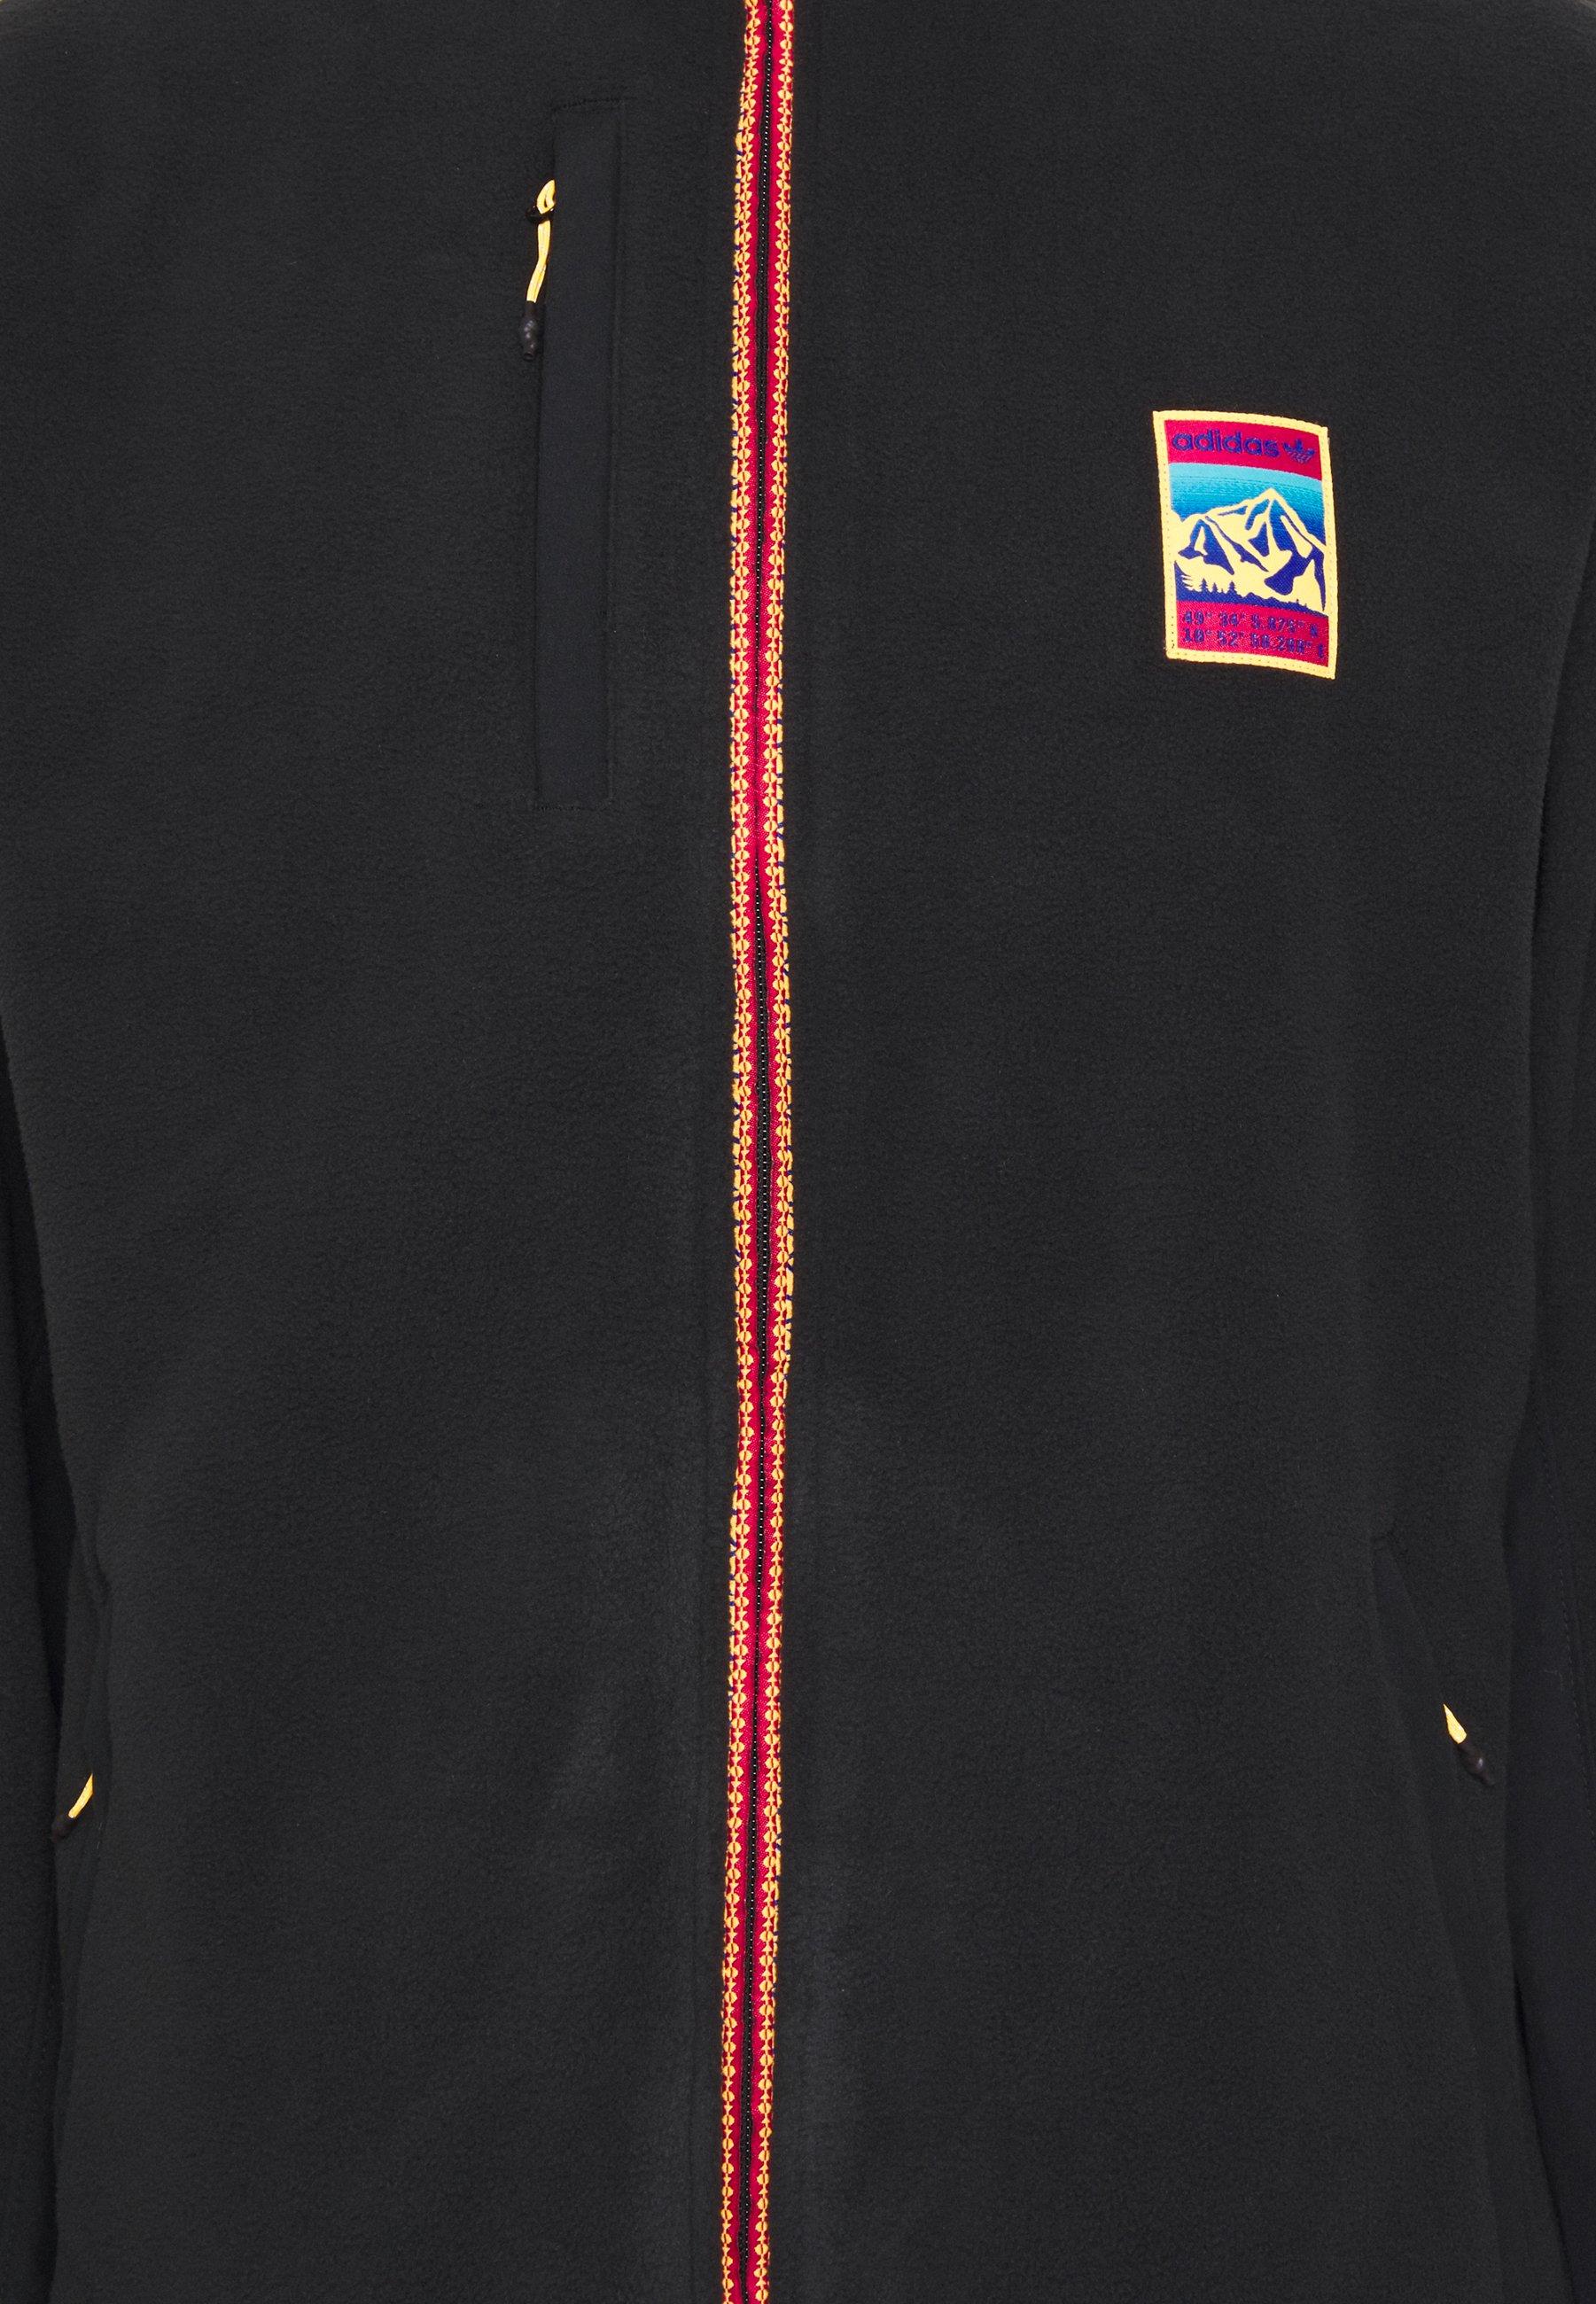 Original Limited New Men's Clothing adidas Originals SPORTS INSPIRED TRACK T Fleece jacket black bSSjXzzhI k5Ud1EDLZ